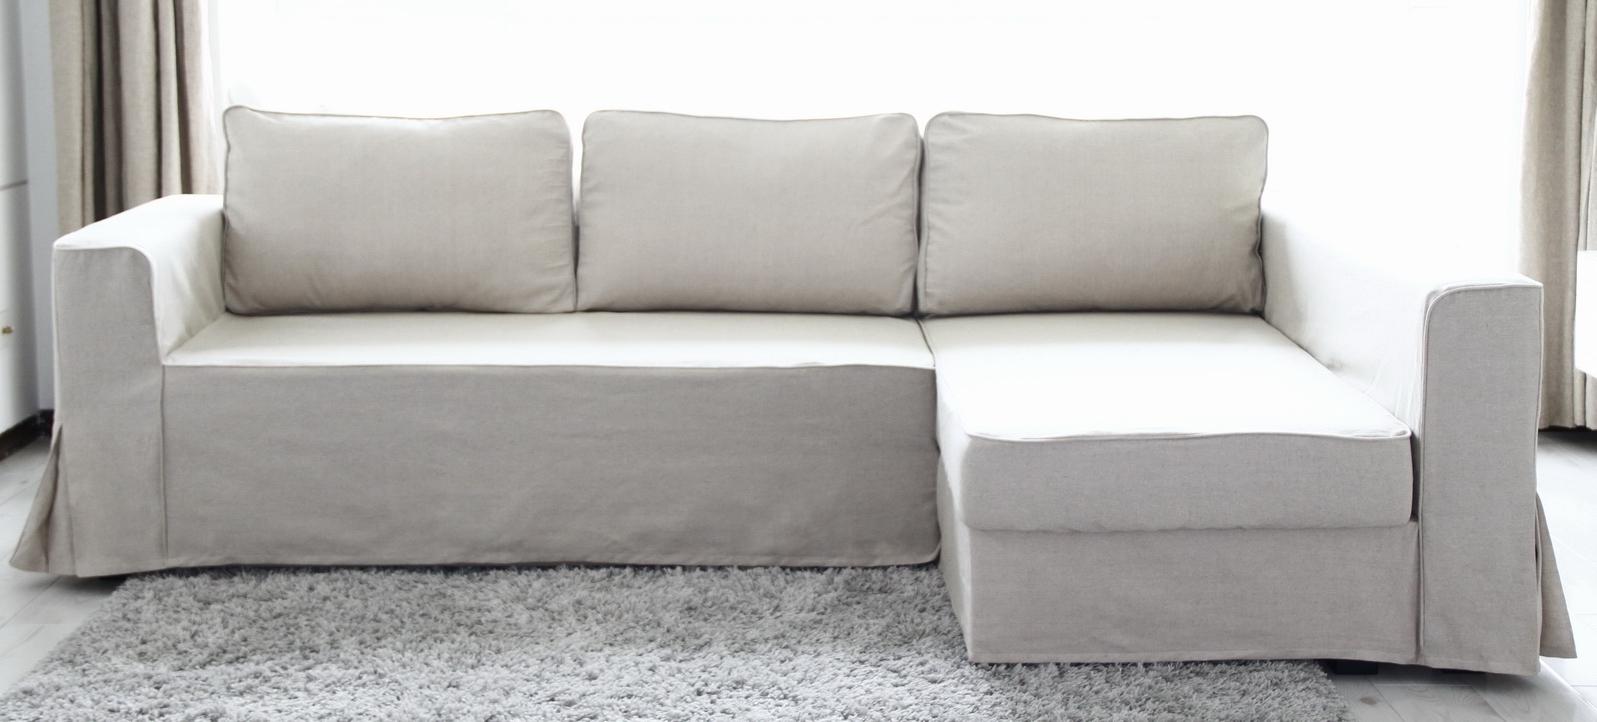 Akia Furniture (View 3 of 15)